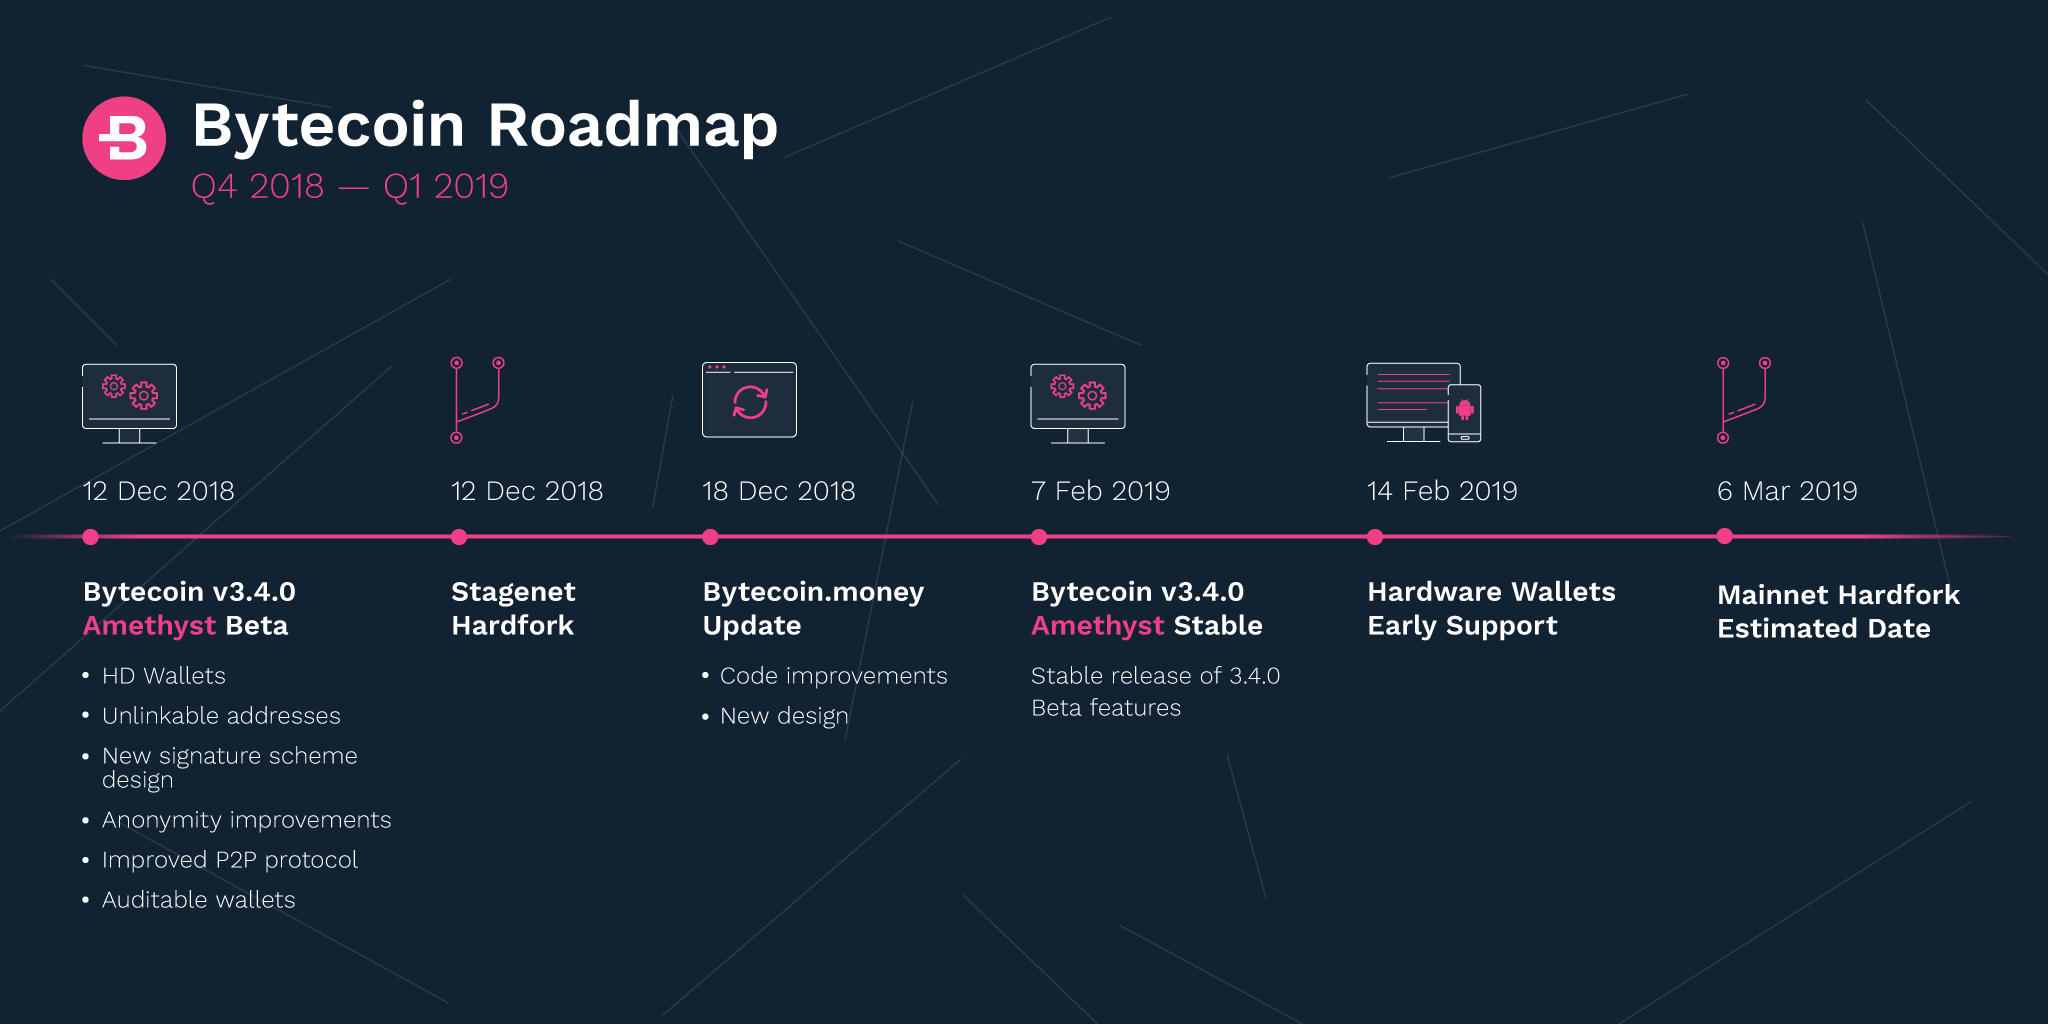 Bytecoin Roadmap - Q4 2018-Q1 2019